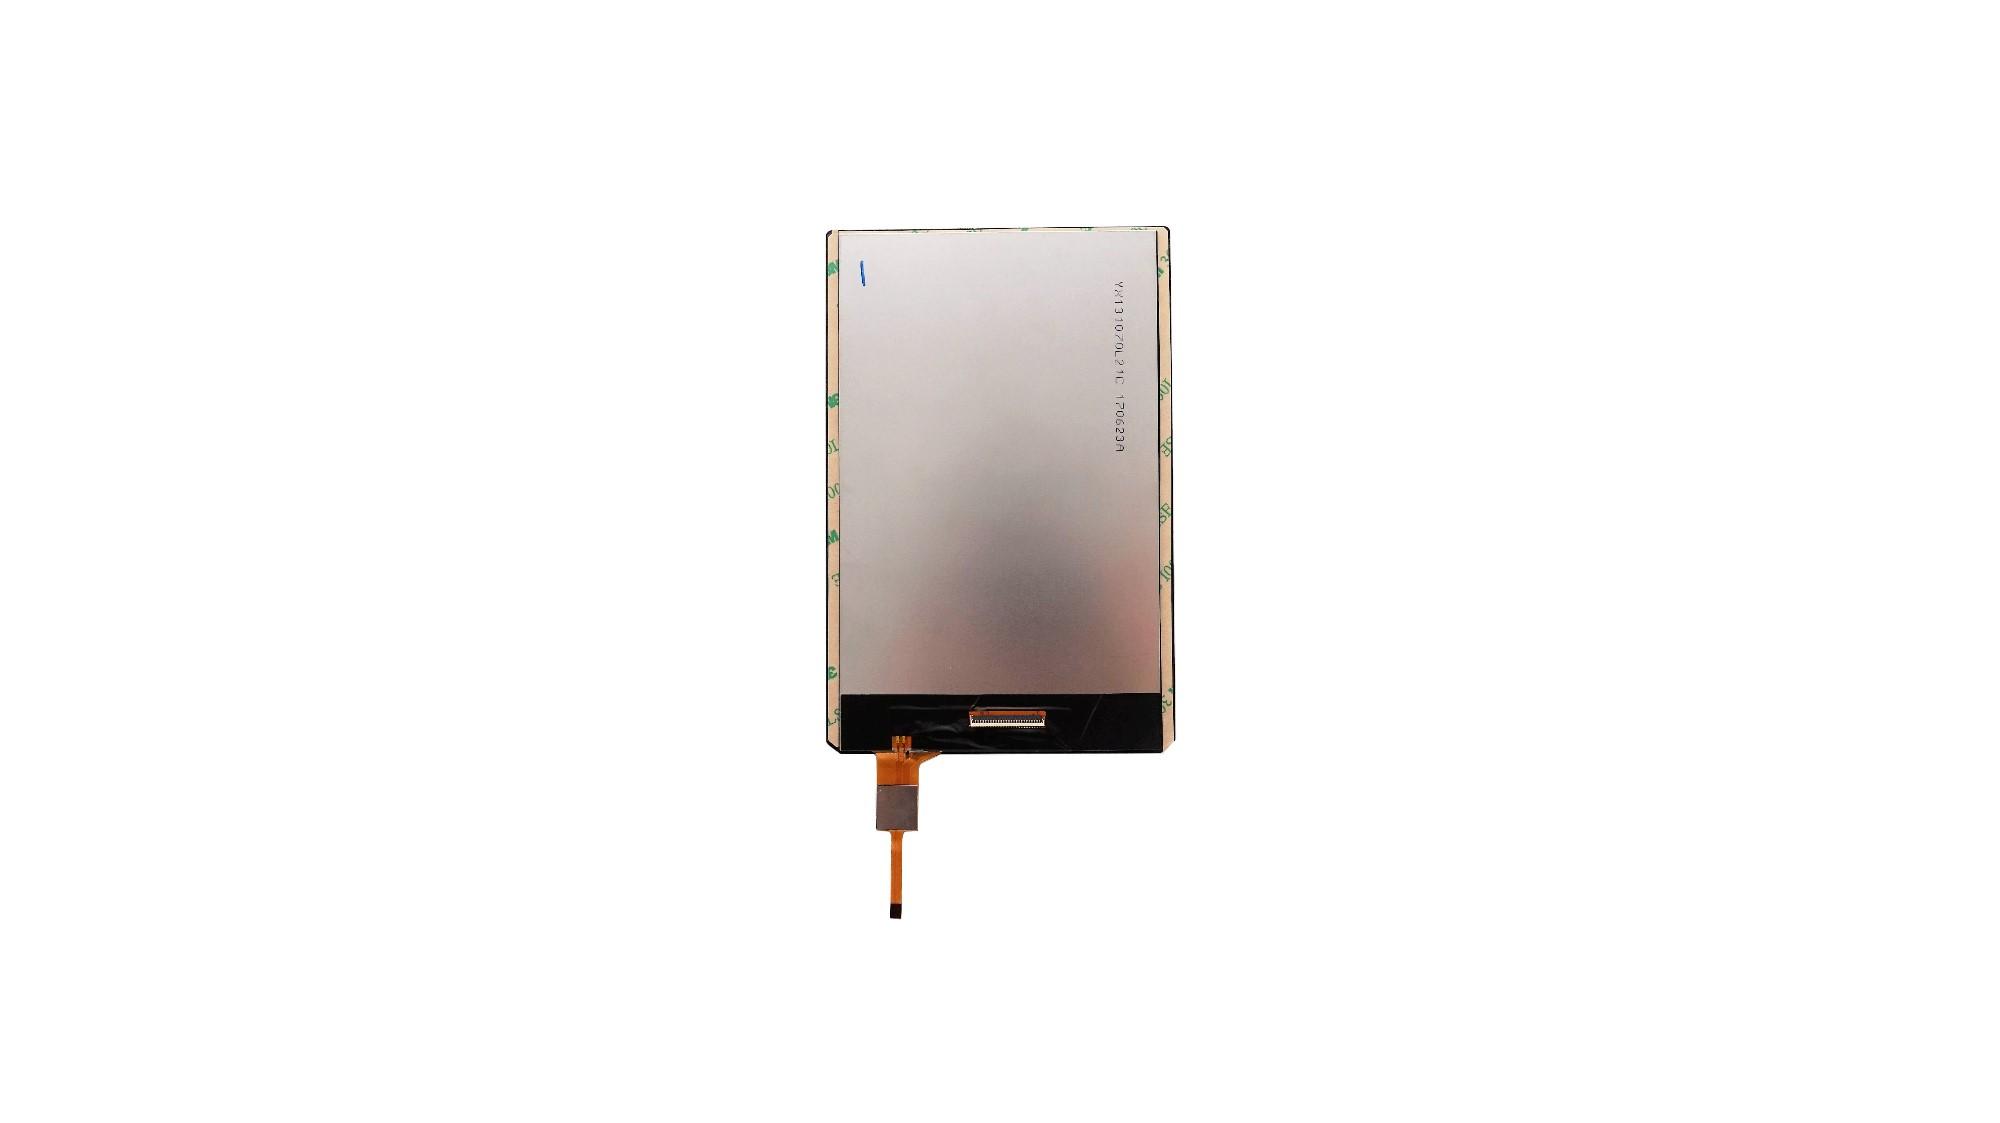 Comprar IPS 7.0 pulgadas TFT Lcd 1200x1920 alto brillo Lcd con Pcap, IPS 7.0 pulgadas TFT Lcd 1200x1920 alto brillo Lcd con Pcap Precios, IPS 7.0 pulgadas TFT Lcd 1200x1920 alto brillo Lcd con Pcap Marcas, IPS 7.0 pulgadas TFT Lcd 1200x1920 alto brillo Lcd con Pcap Fabricante, IPS 7.0 pulgadas TFT Lcd 1200x1920 alto brillo Lcd con Pcap Citas, IPS 7.0 pulgadas TFT Lcd 1200x1920 alto brillo Lcd con Pcap Empresa.